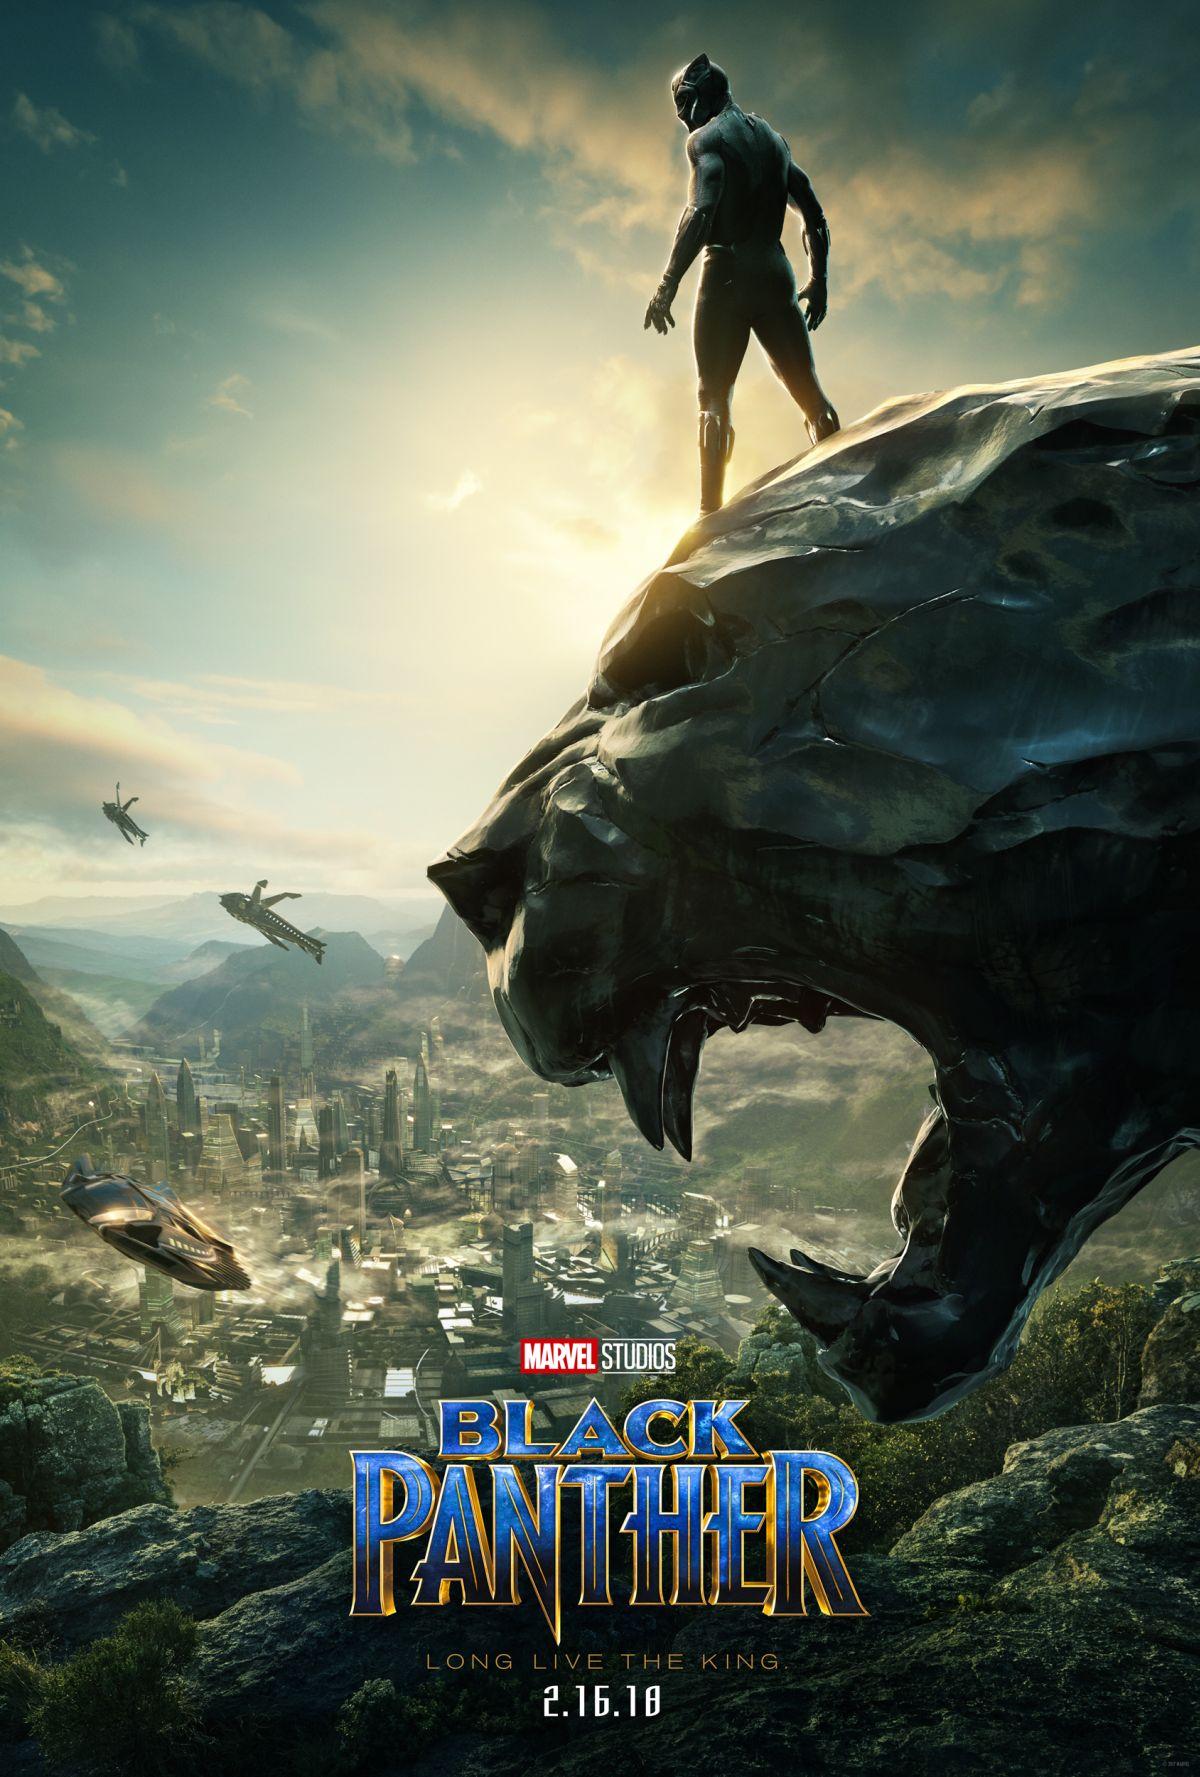 Black Panther: la nuova locandina del film: 454960 - Movieplayer.it